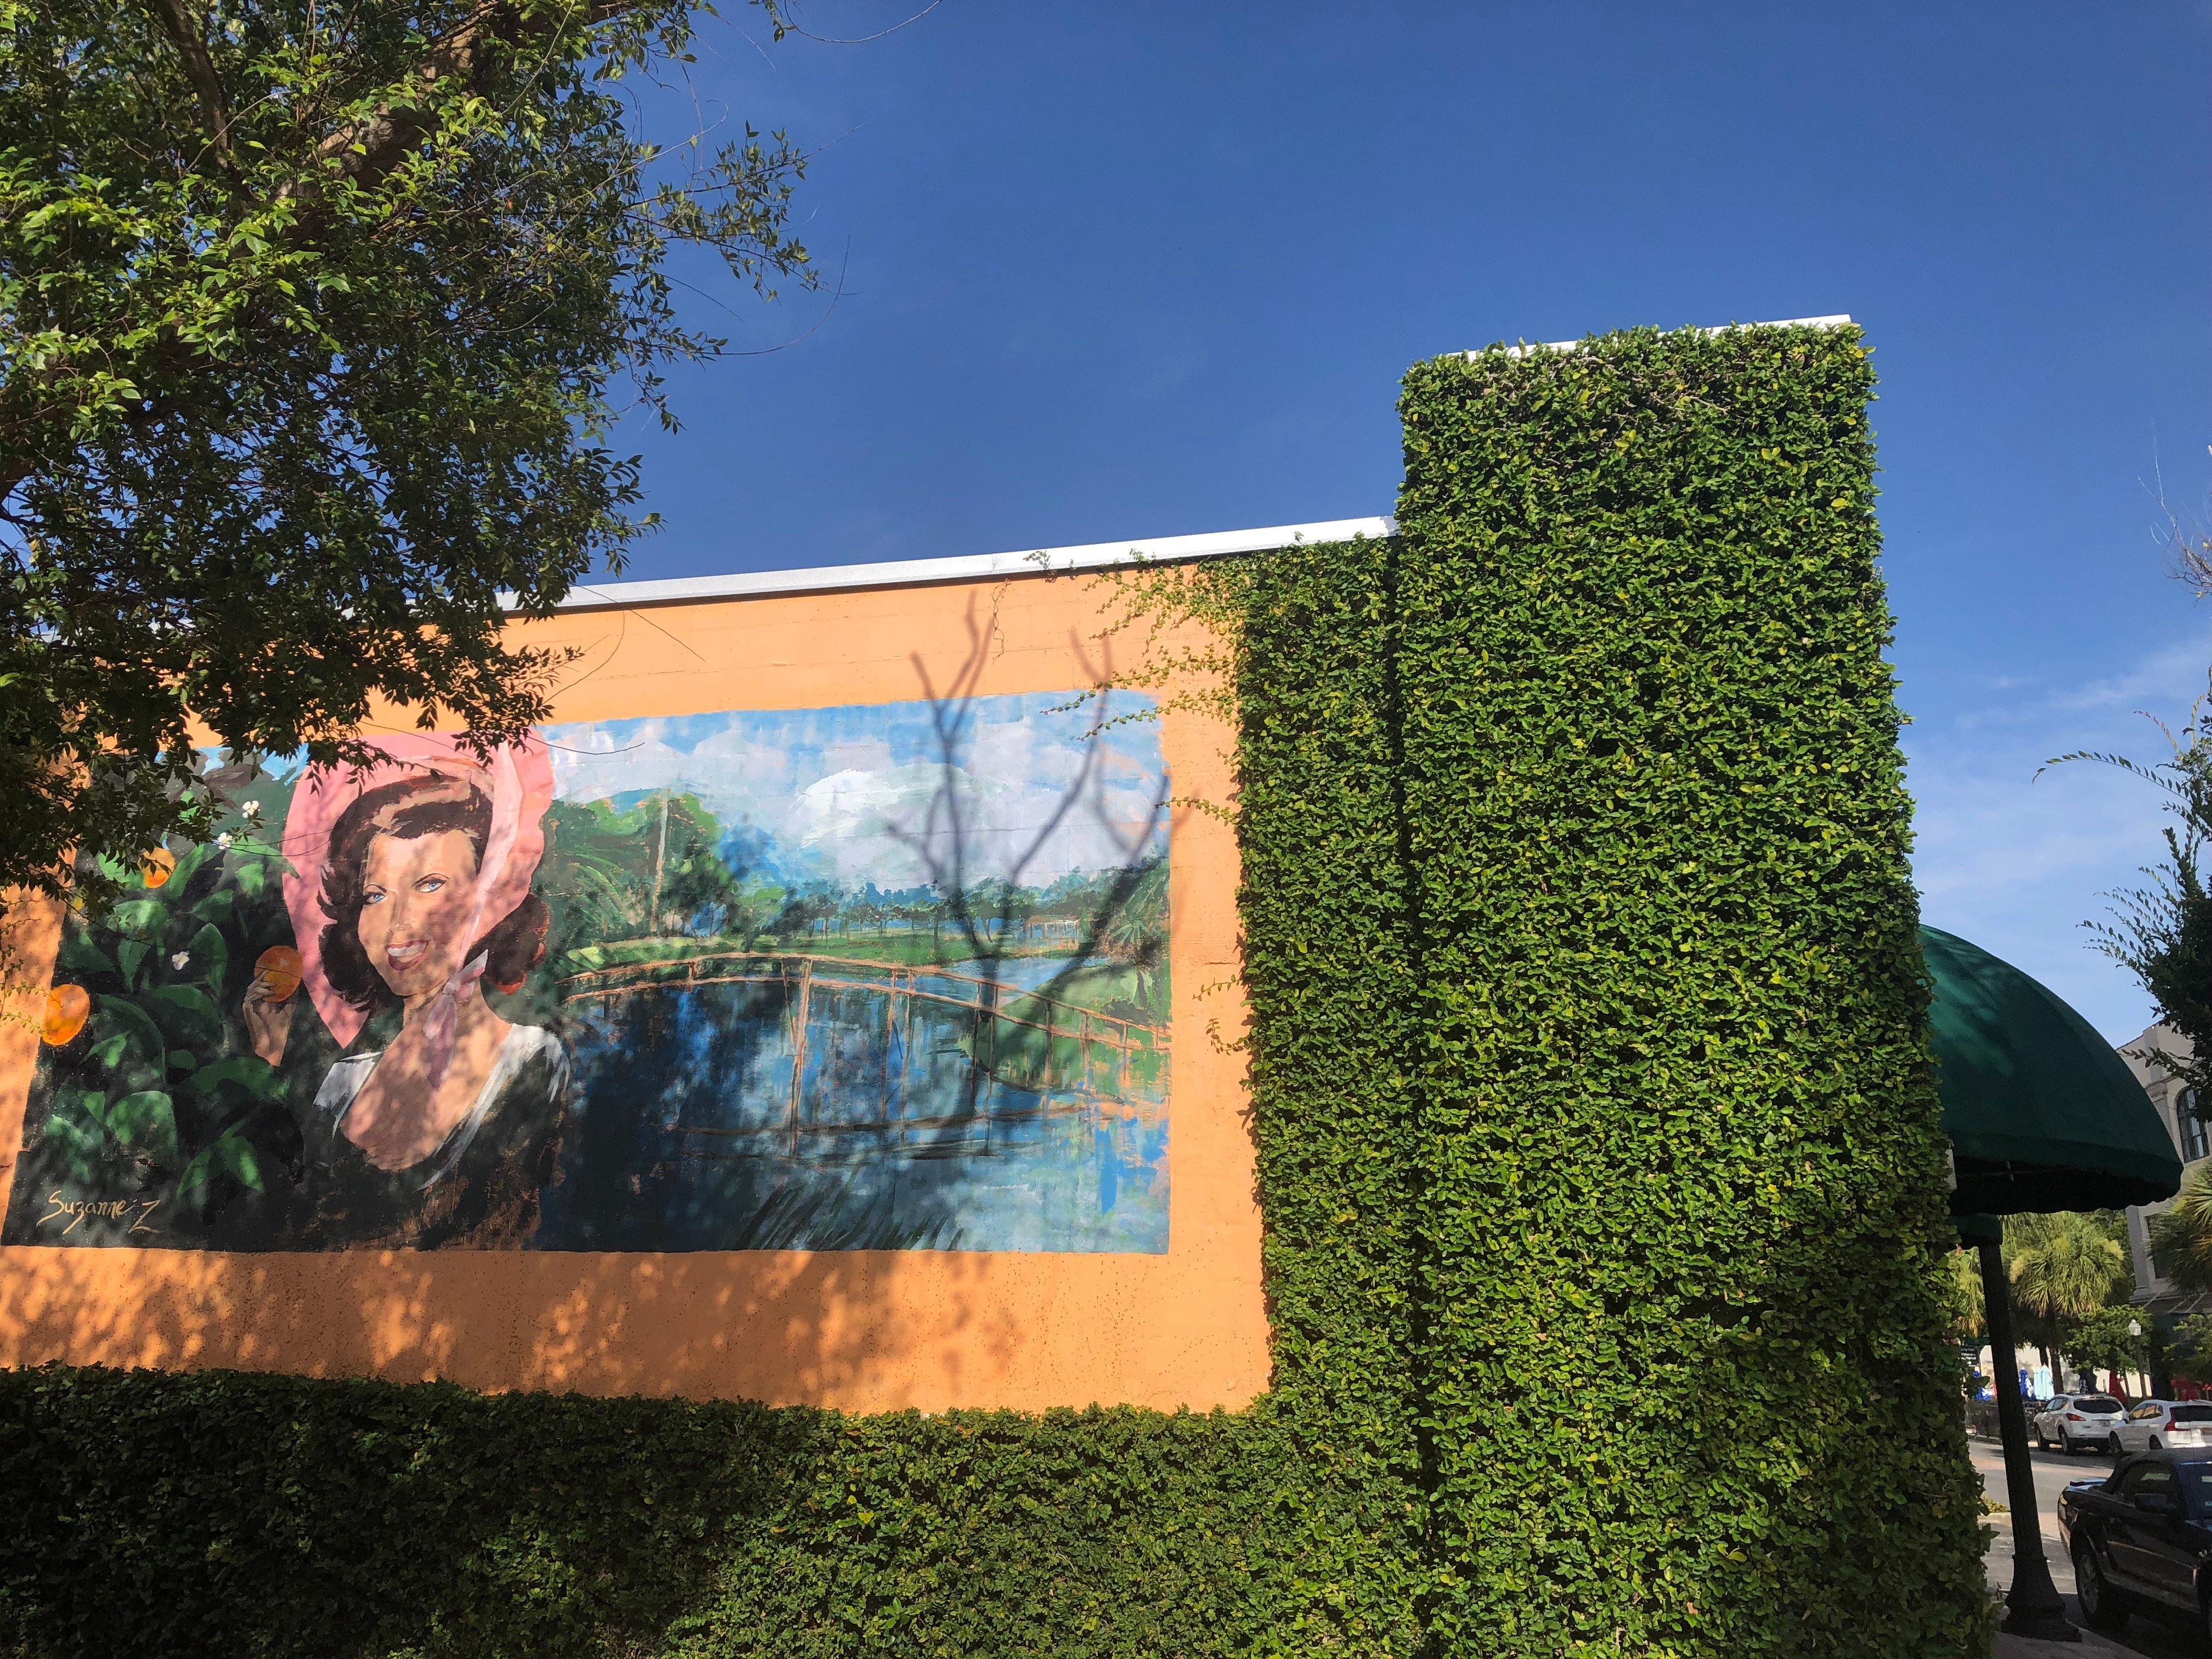 Downtown Leesburg, FL mural